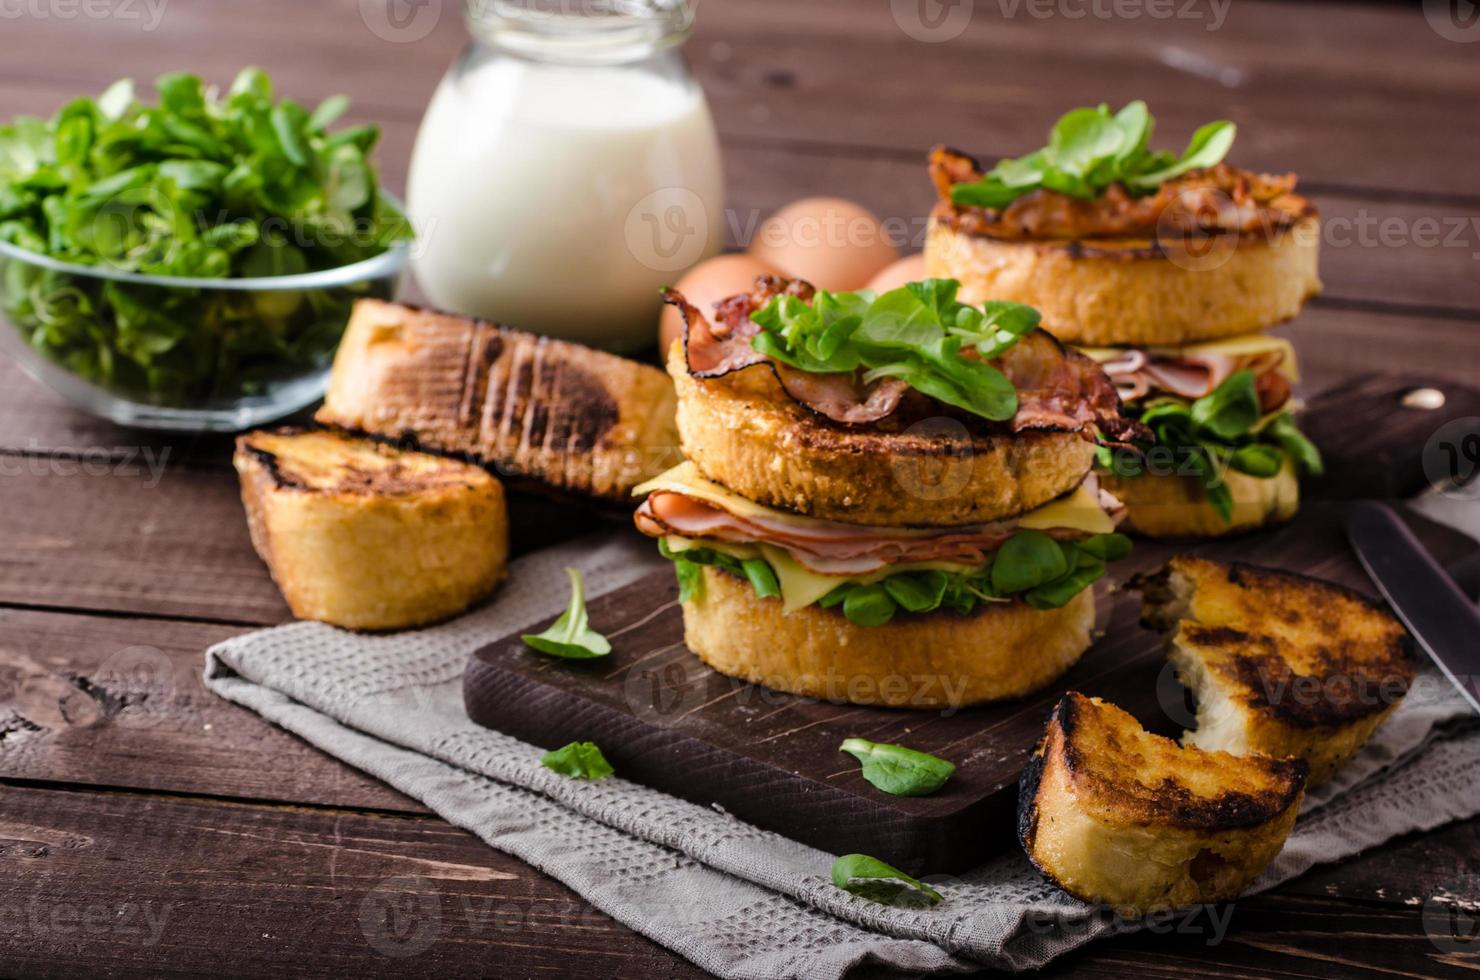 fransk rostat bröd med hemlagad skinka, gouda ost foto